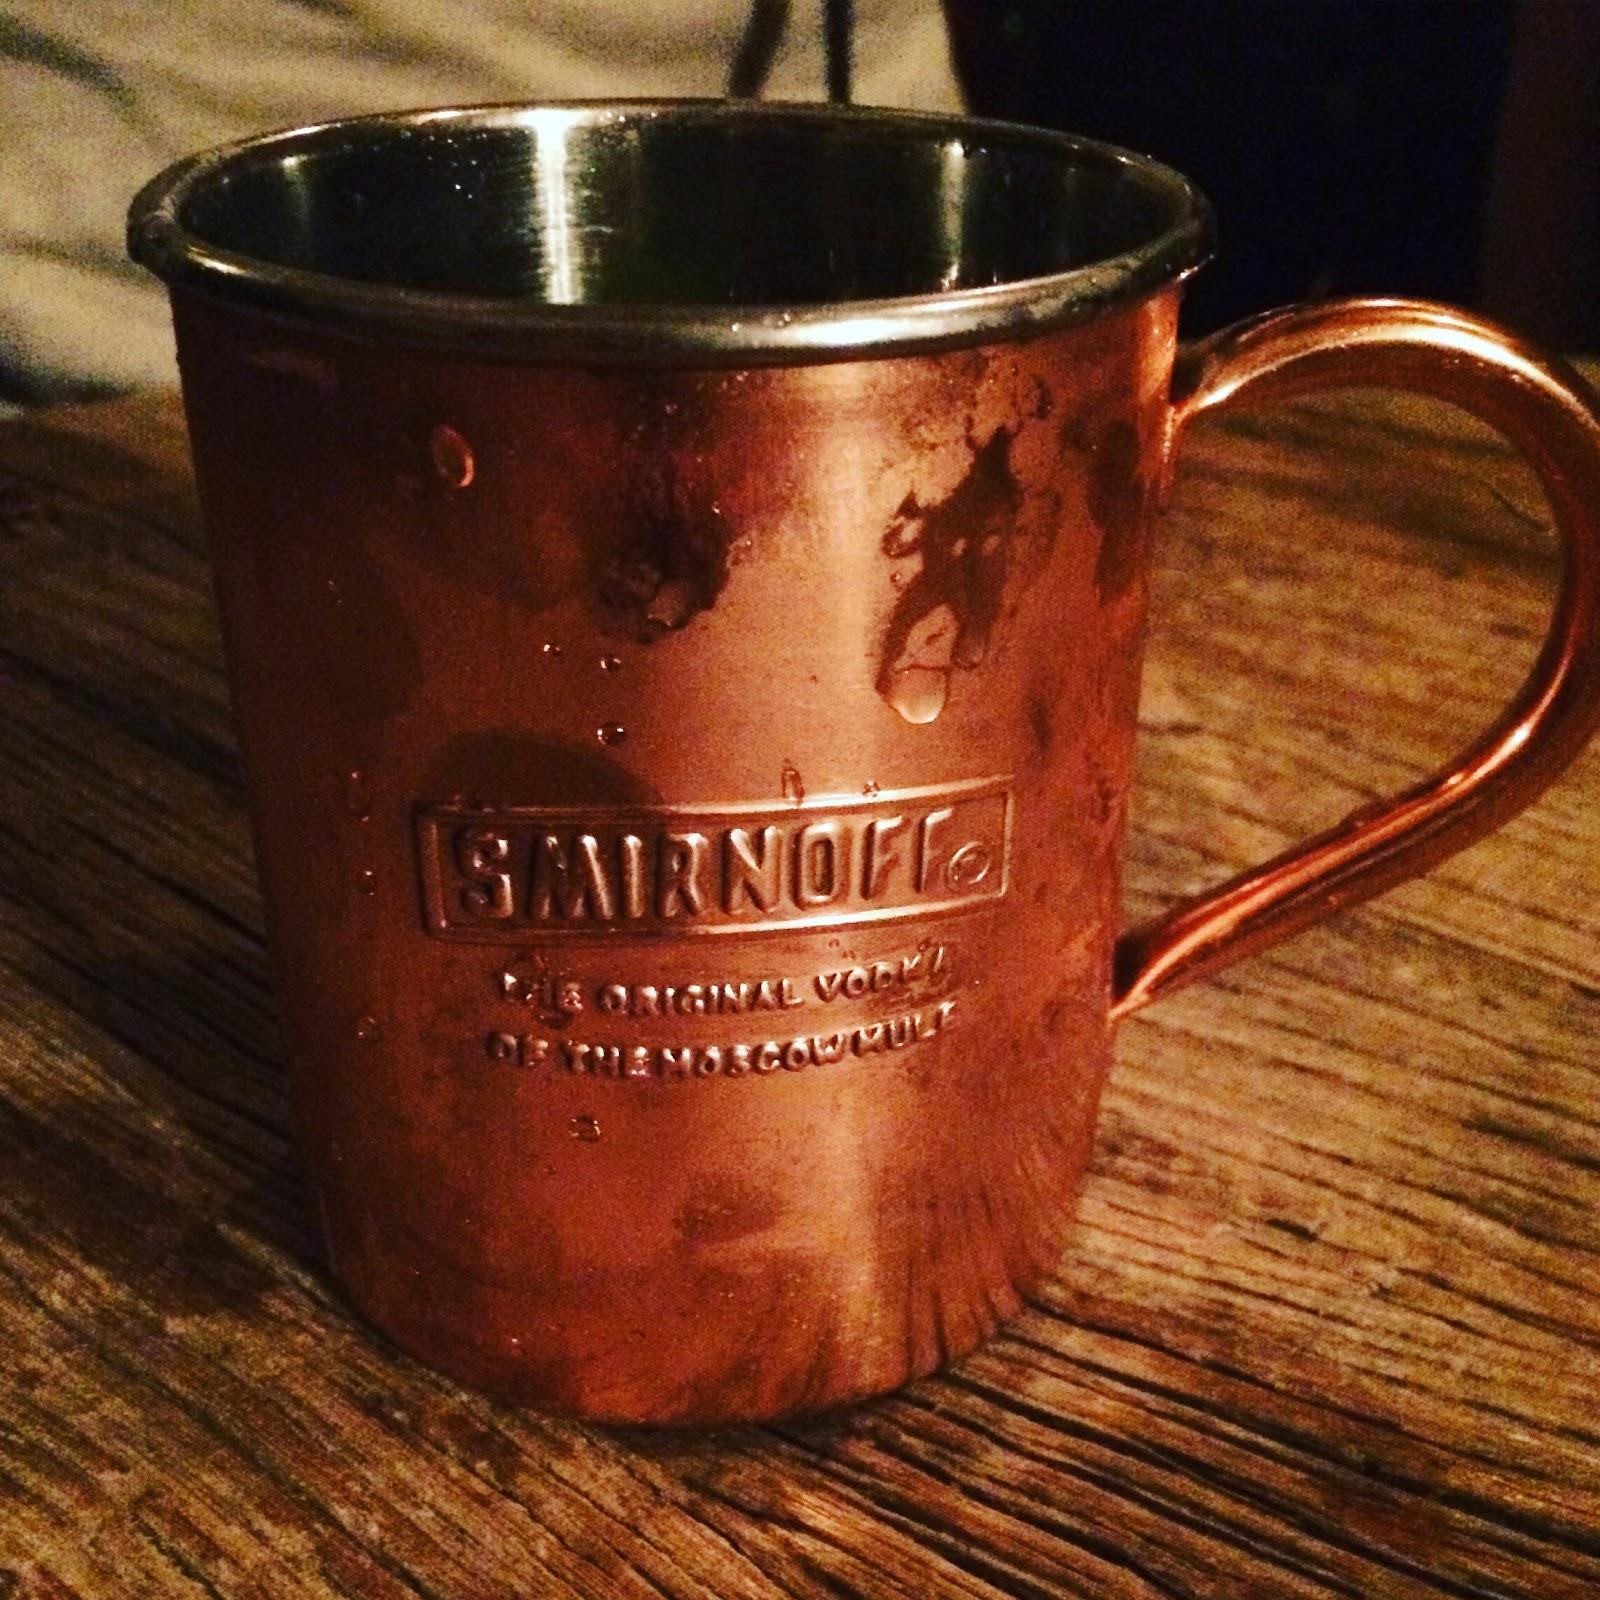 An original Smirnoff Mule mug made with Schmidt's copper